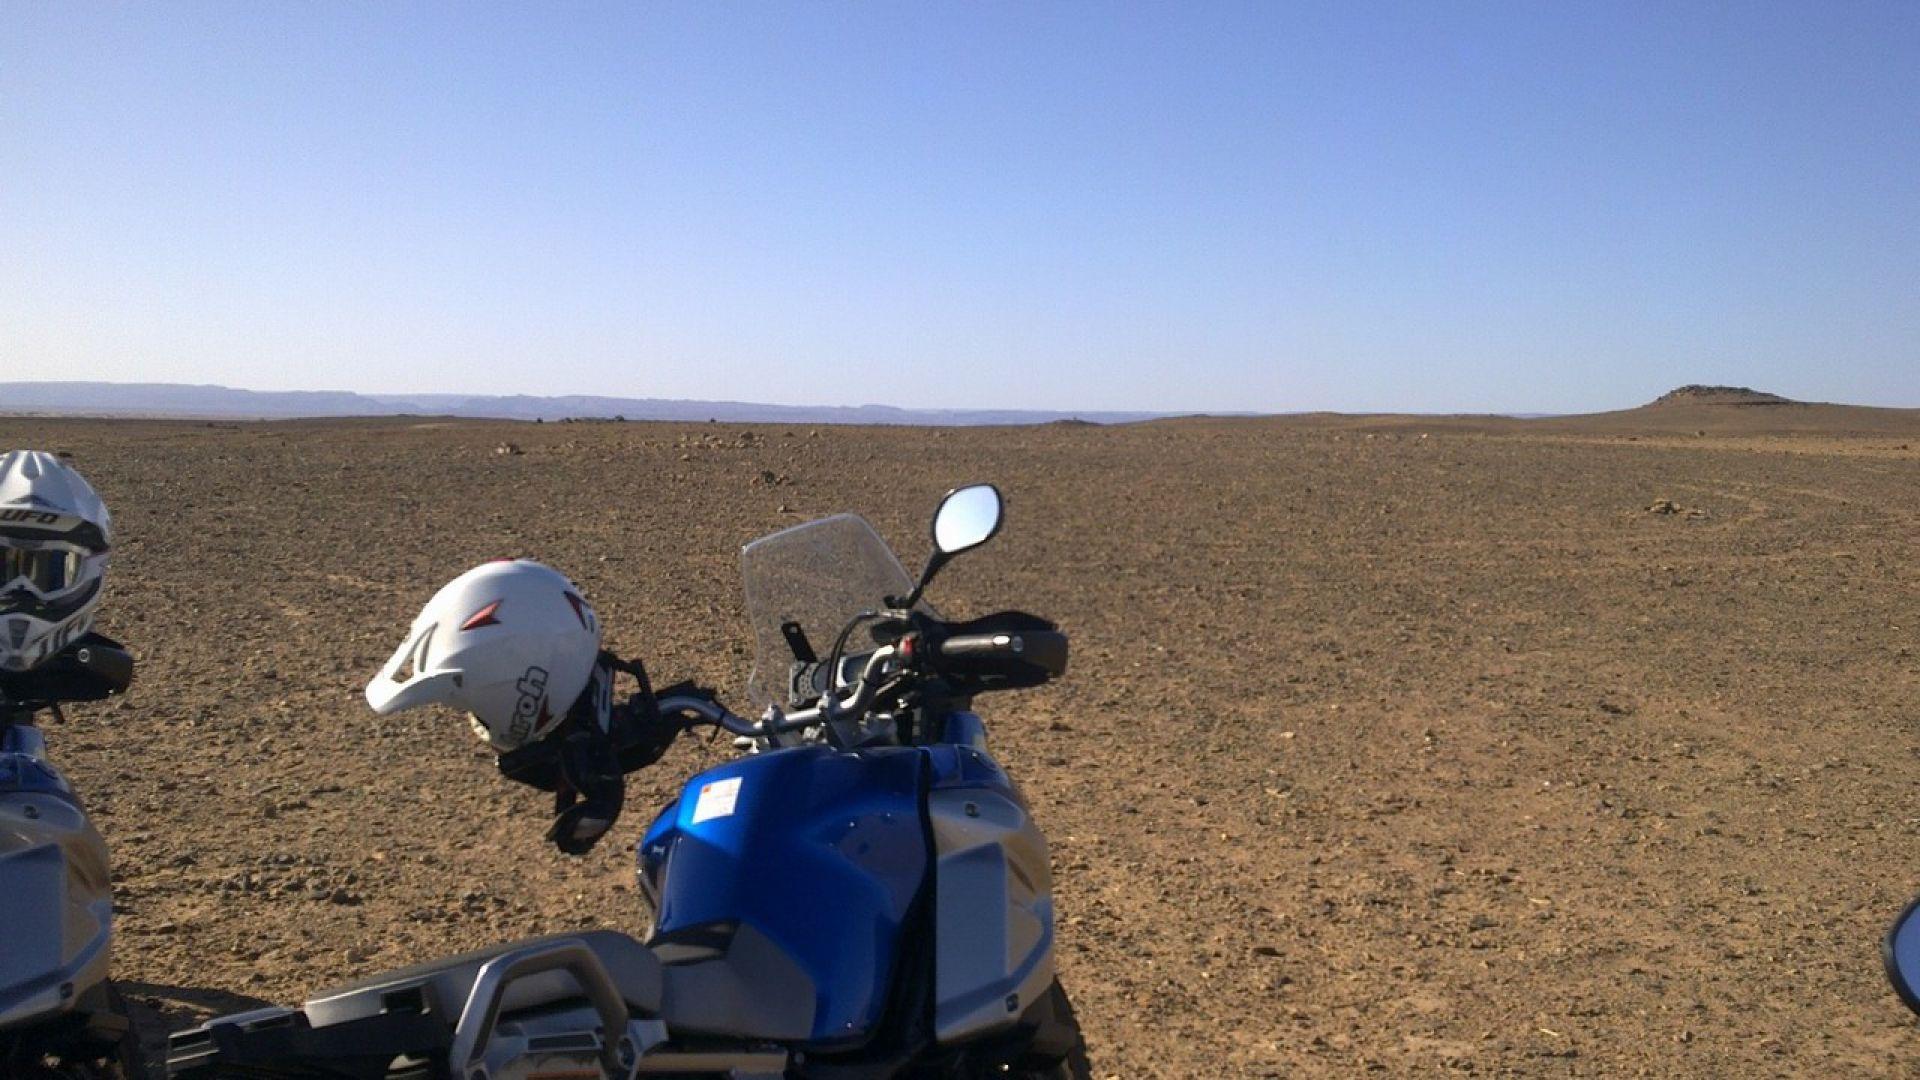 Immagine 188: In Marocco con la Yamaha Super Ténéré